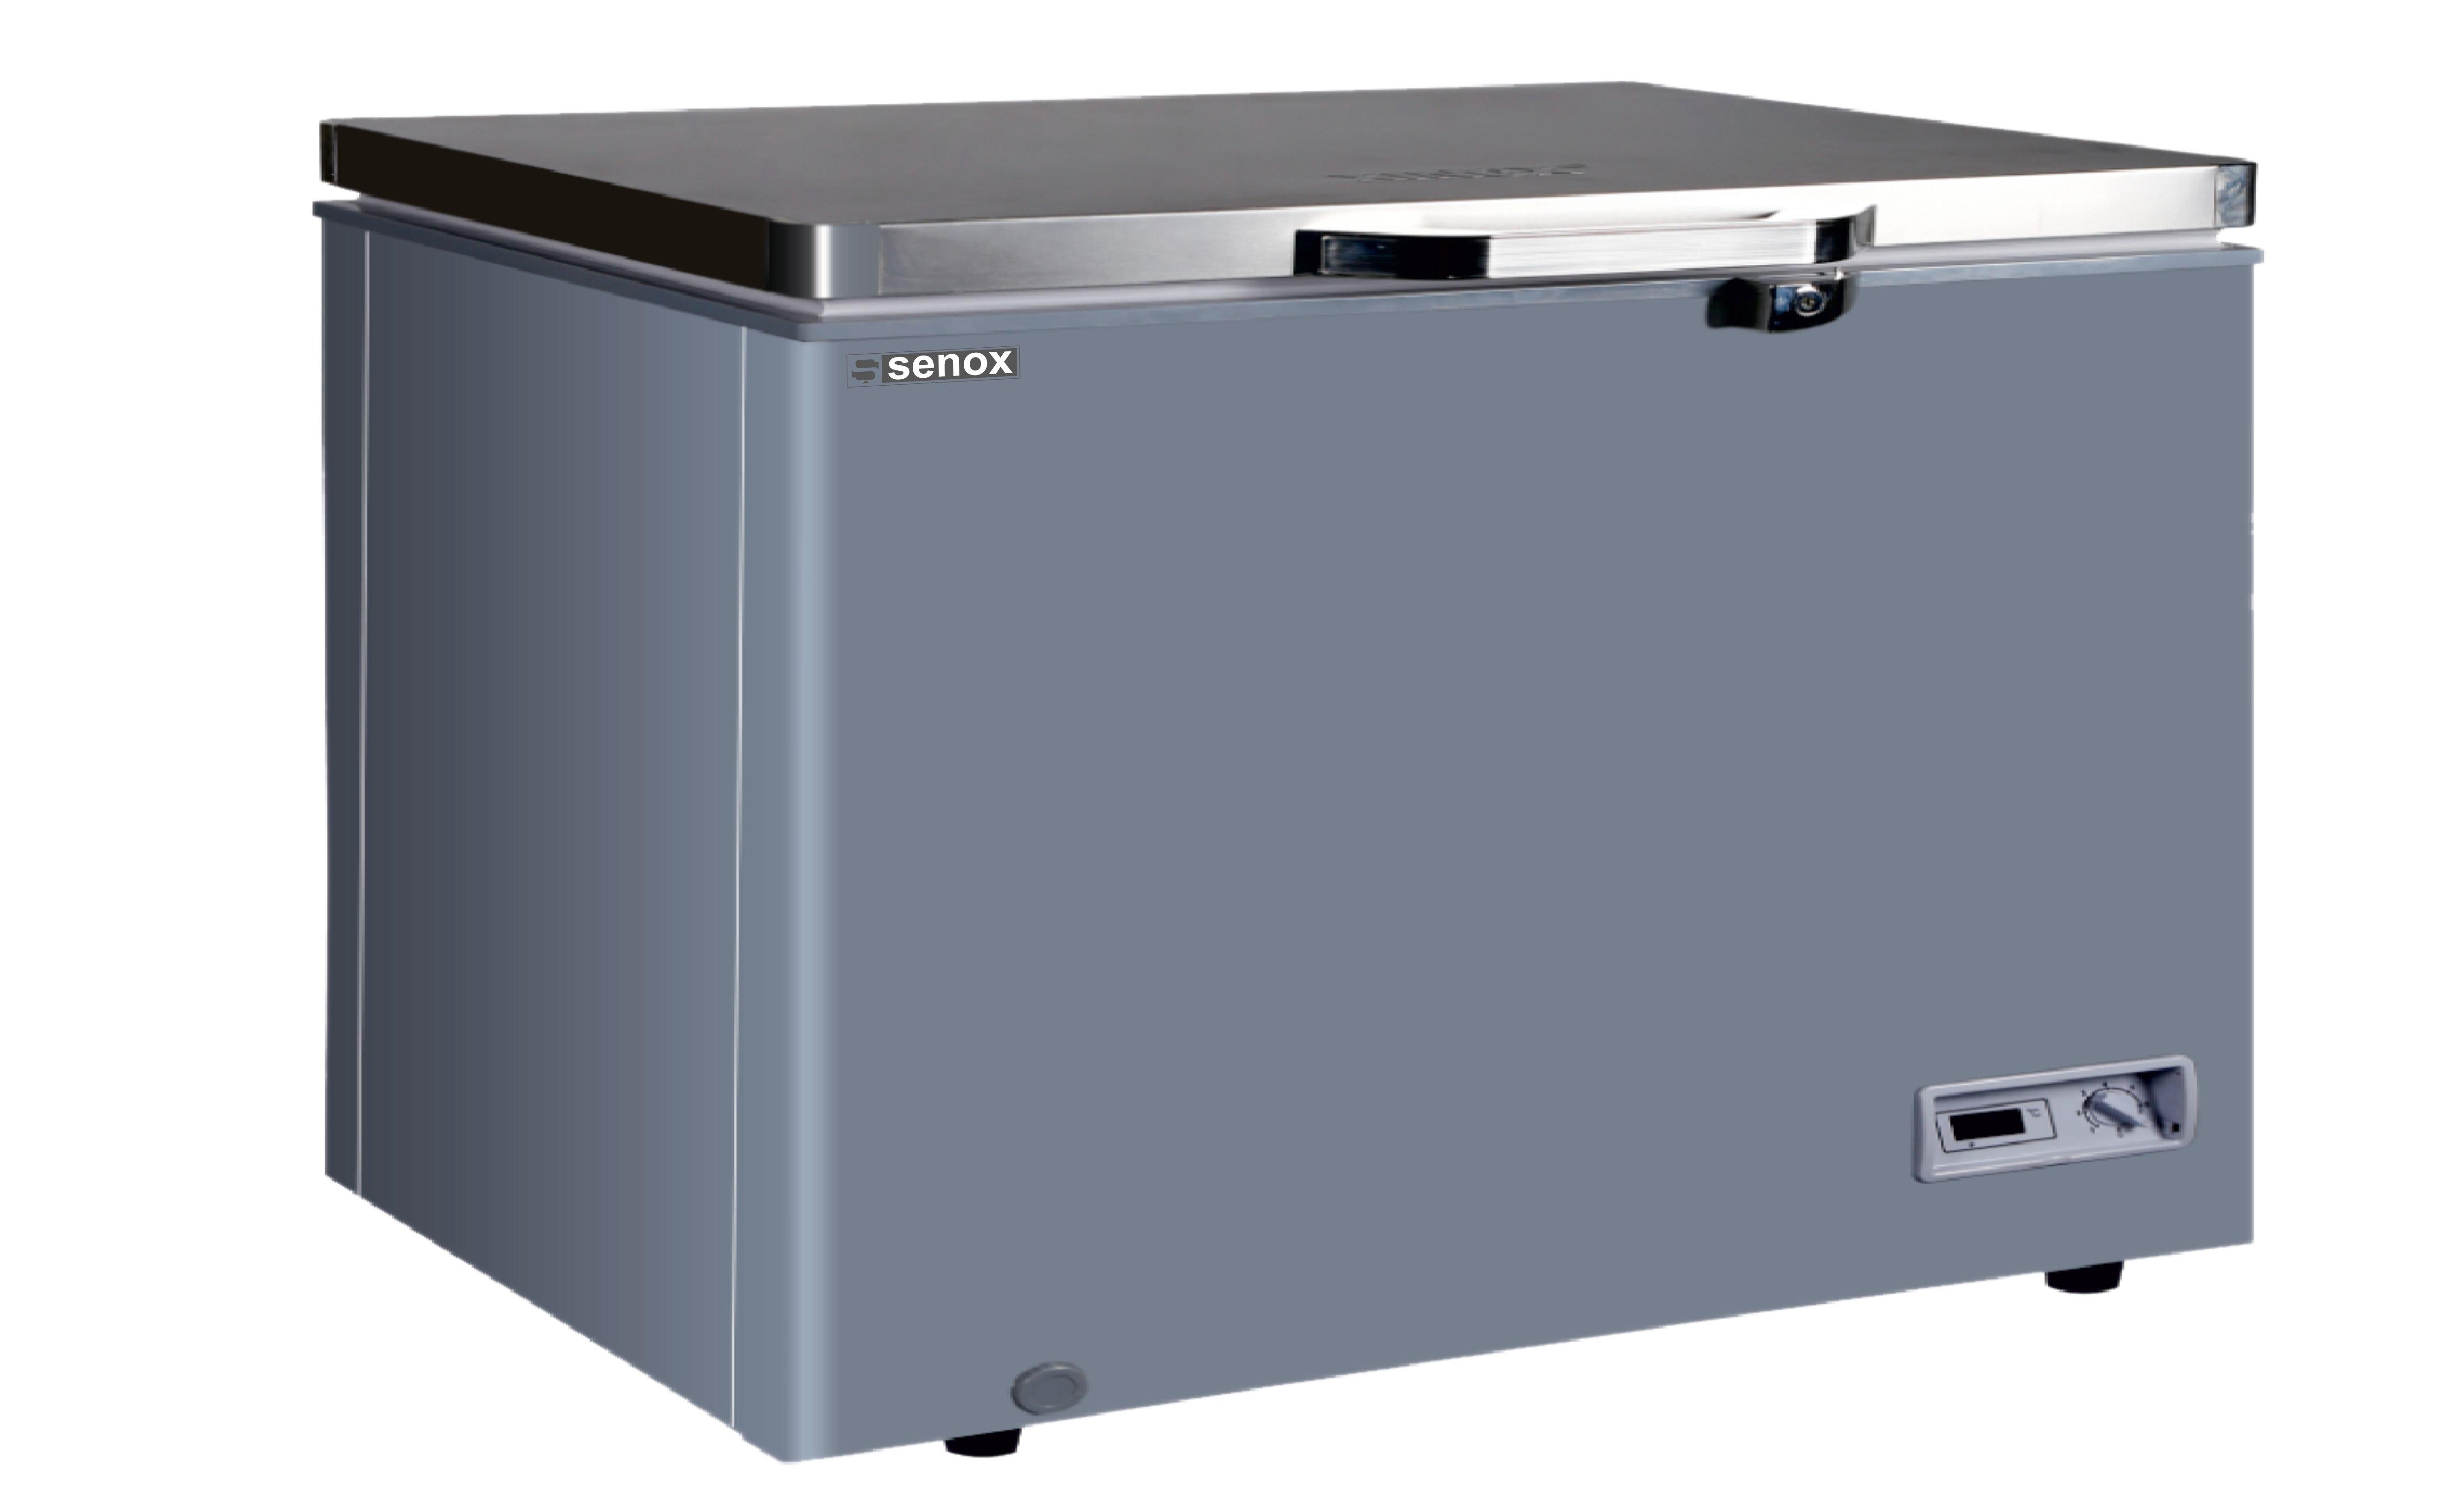 senox-df-300